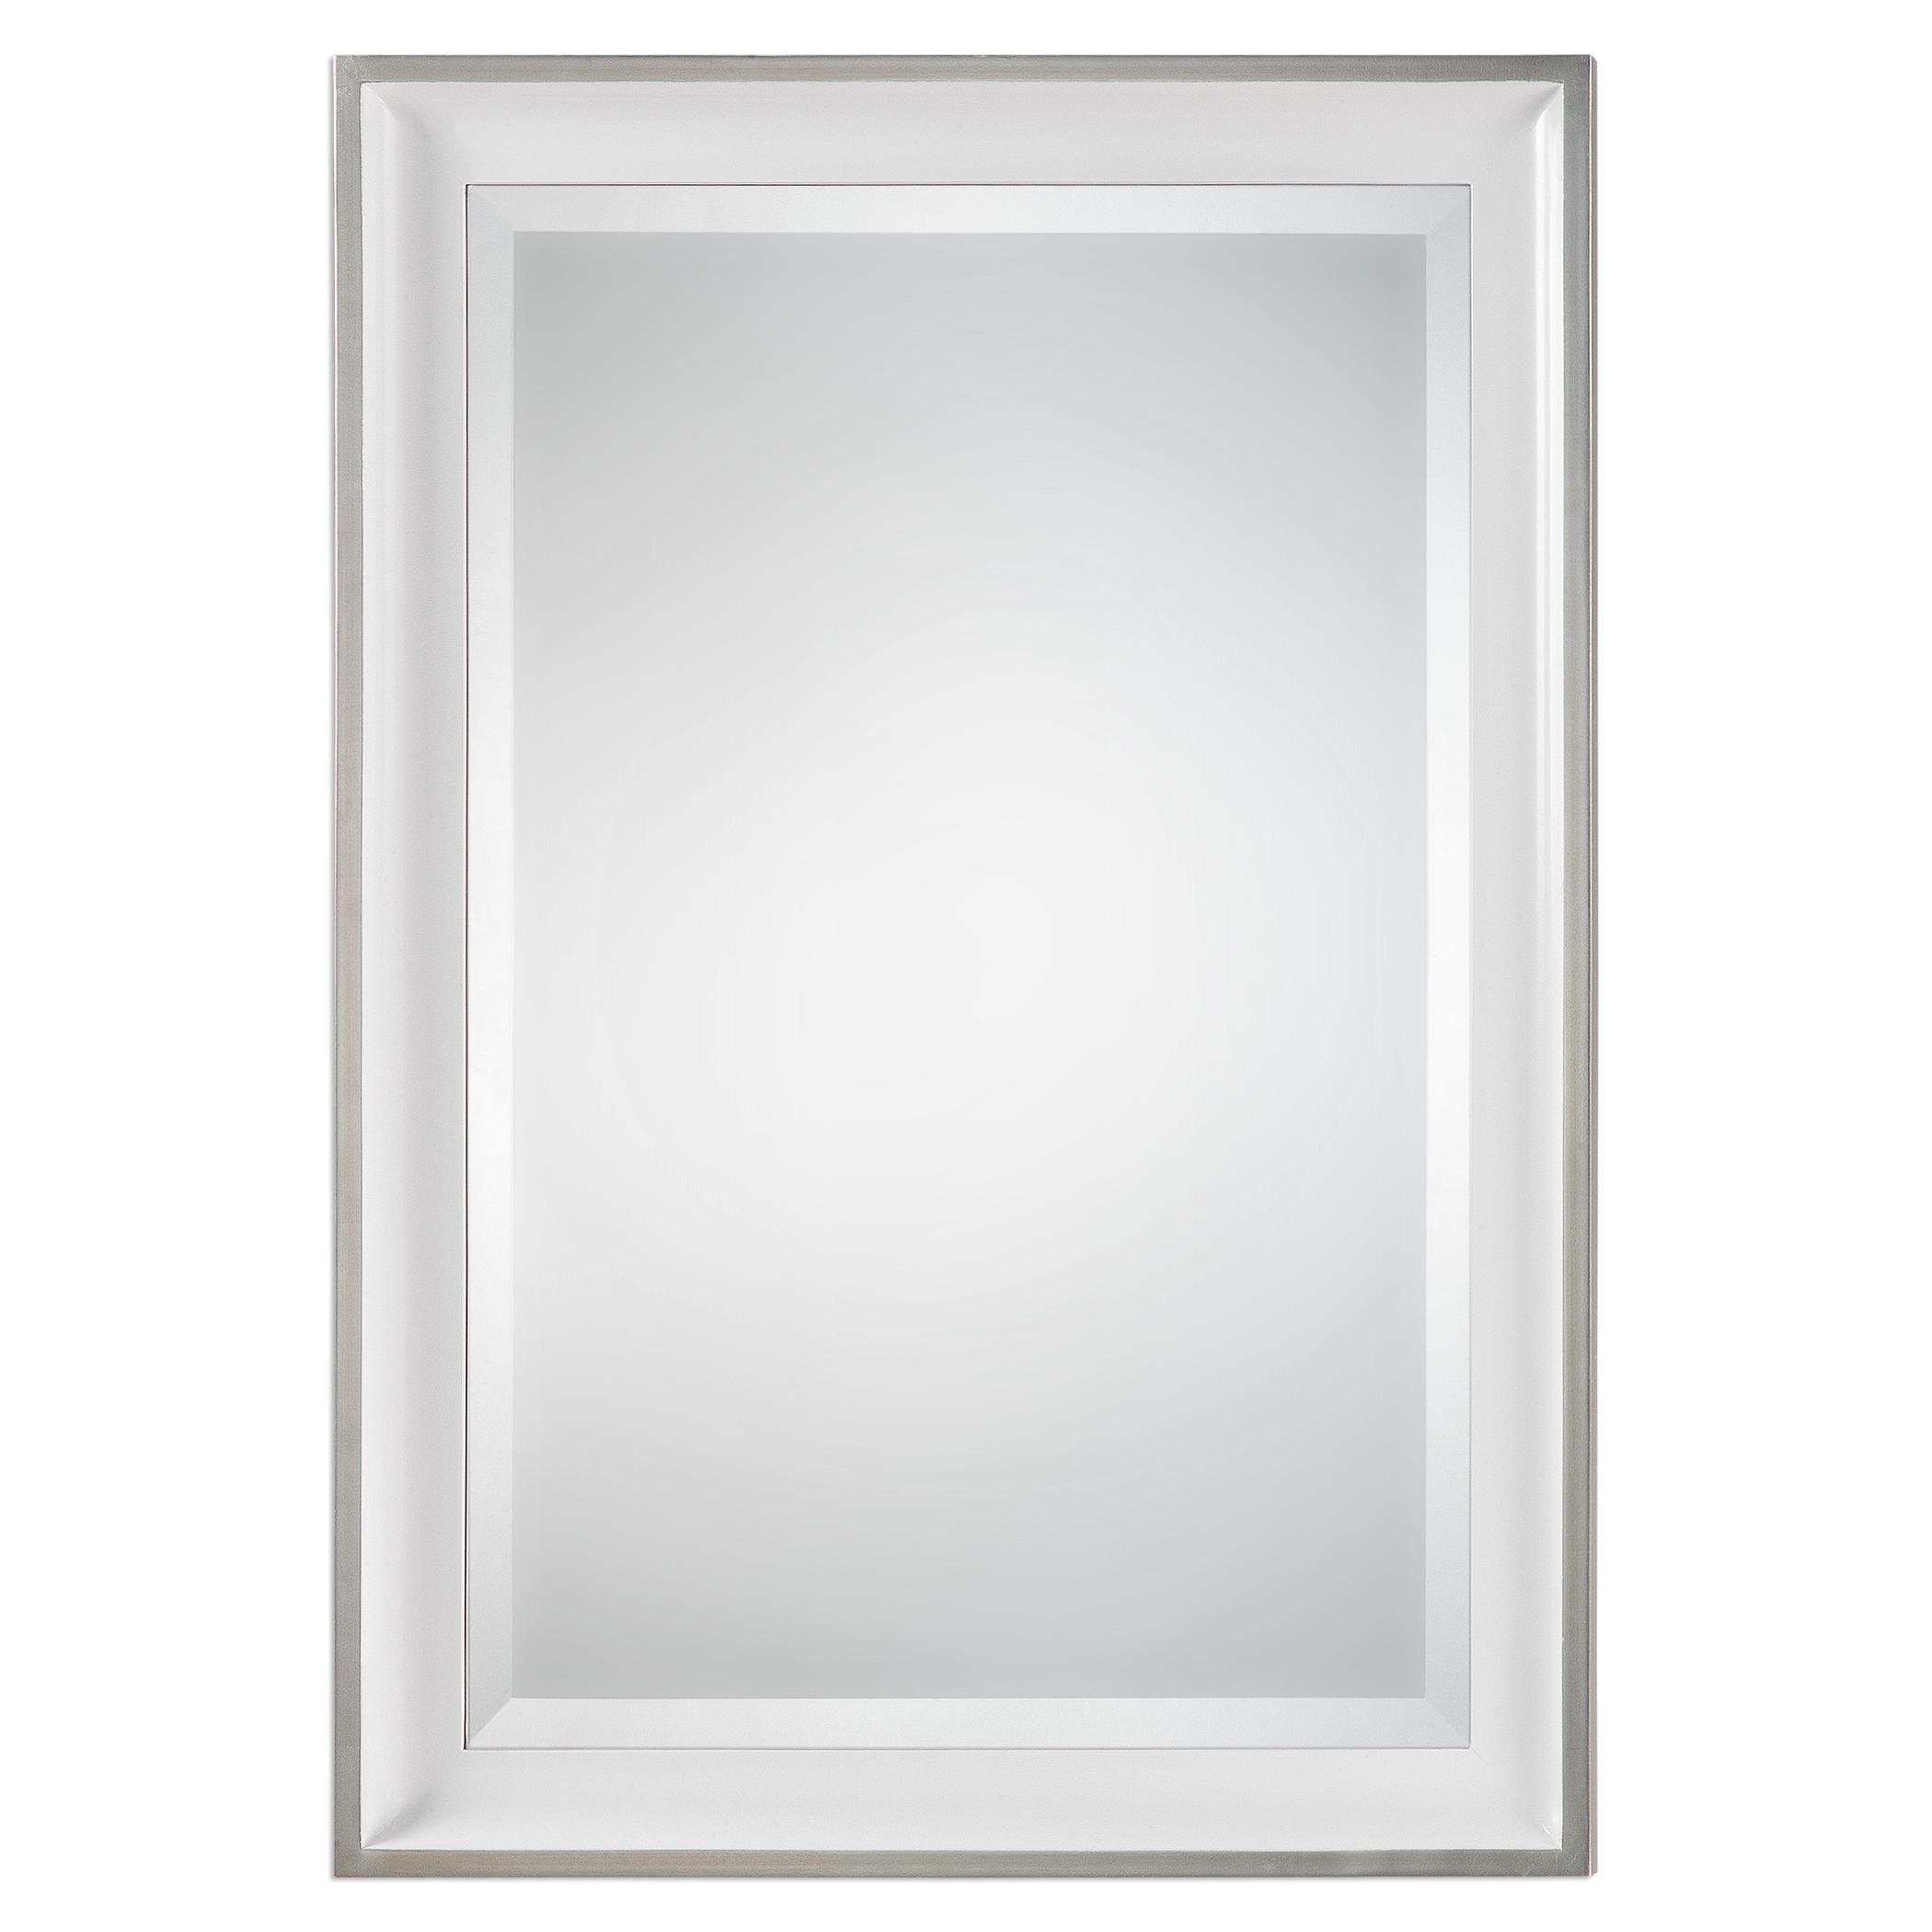 Uttermost Mirrors Lahvahn White Silver Mirror - Item Number: 09081